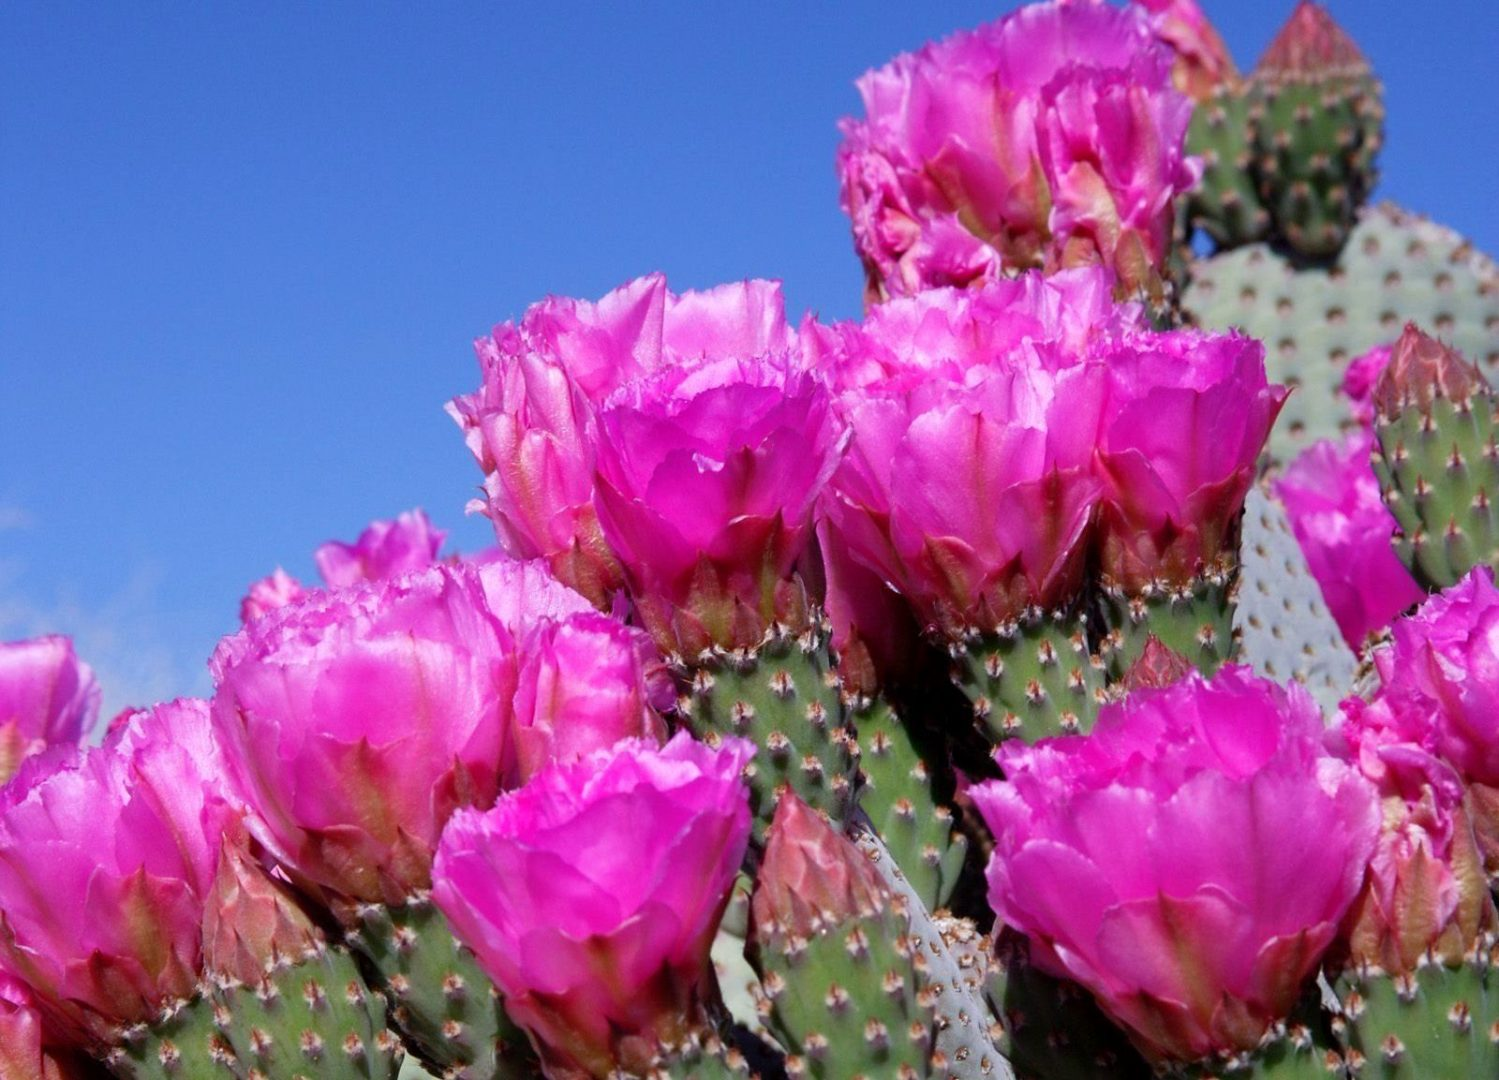 Cactos floridos – Aprenda a cuidar de espécies que surpreendem pela beleza da florada